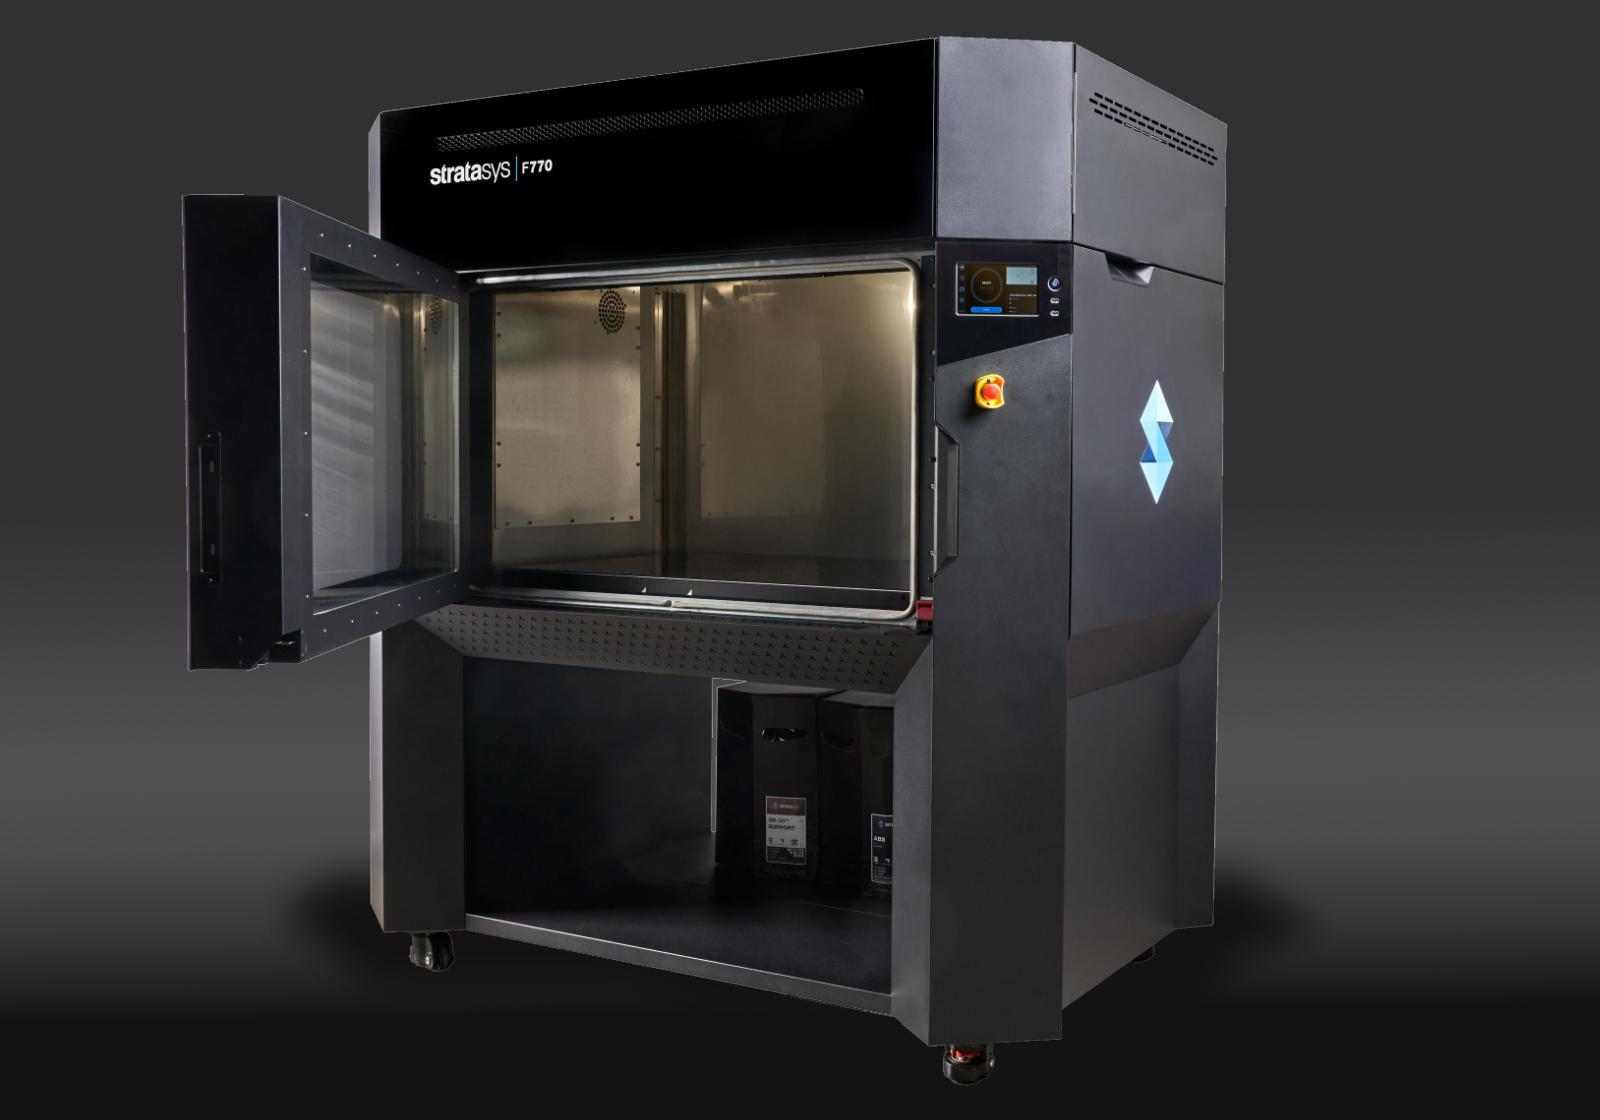 F770 Large Scale 3D Printer